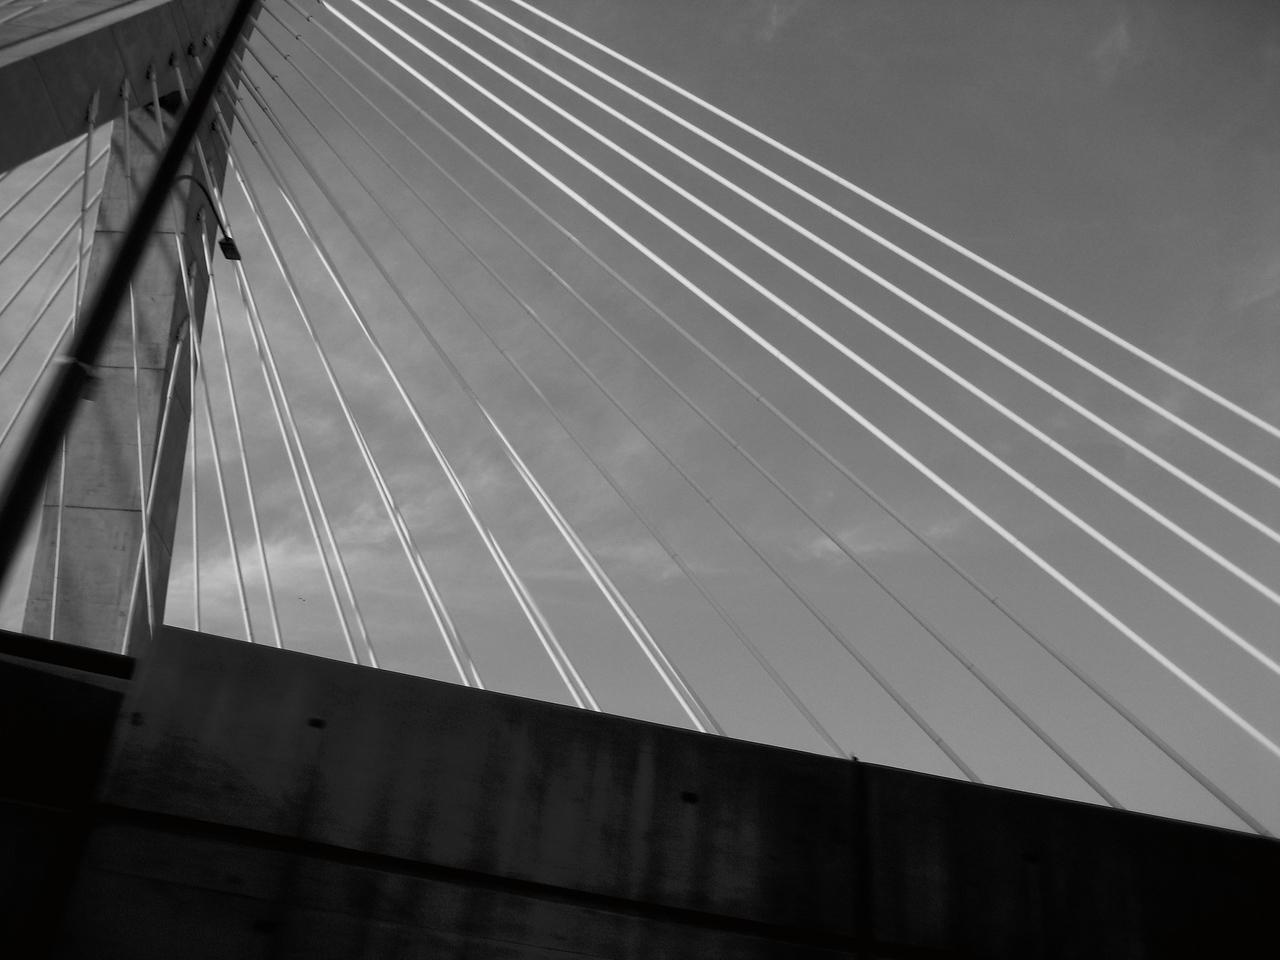 Bridge with lighter sky.